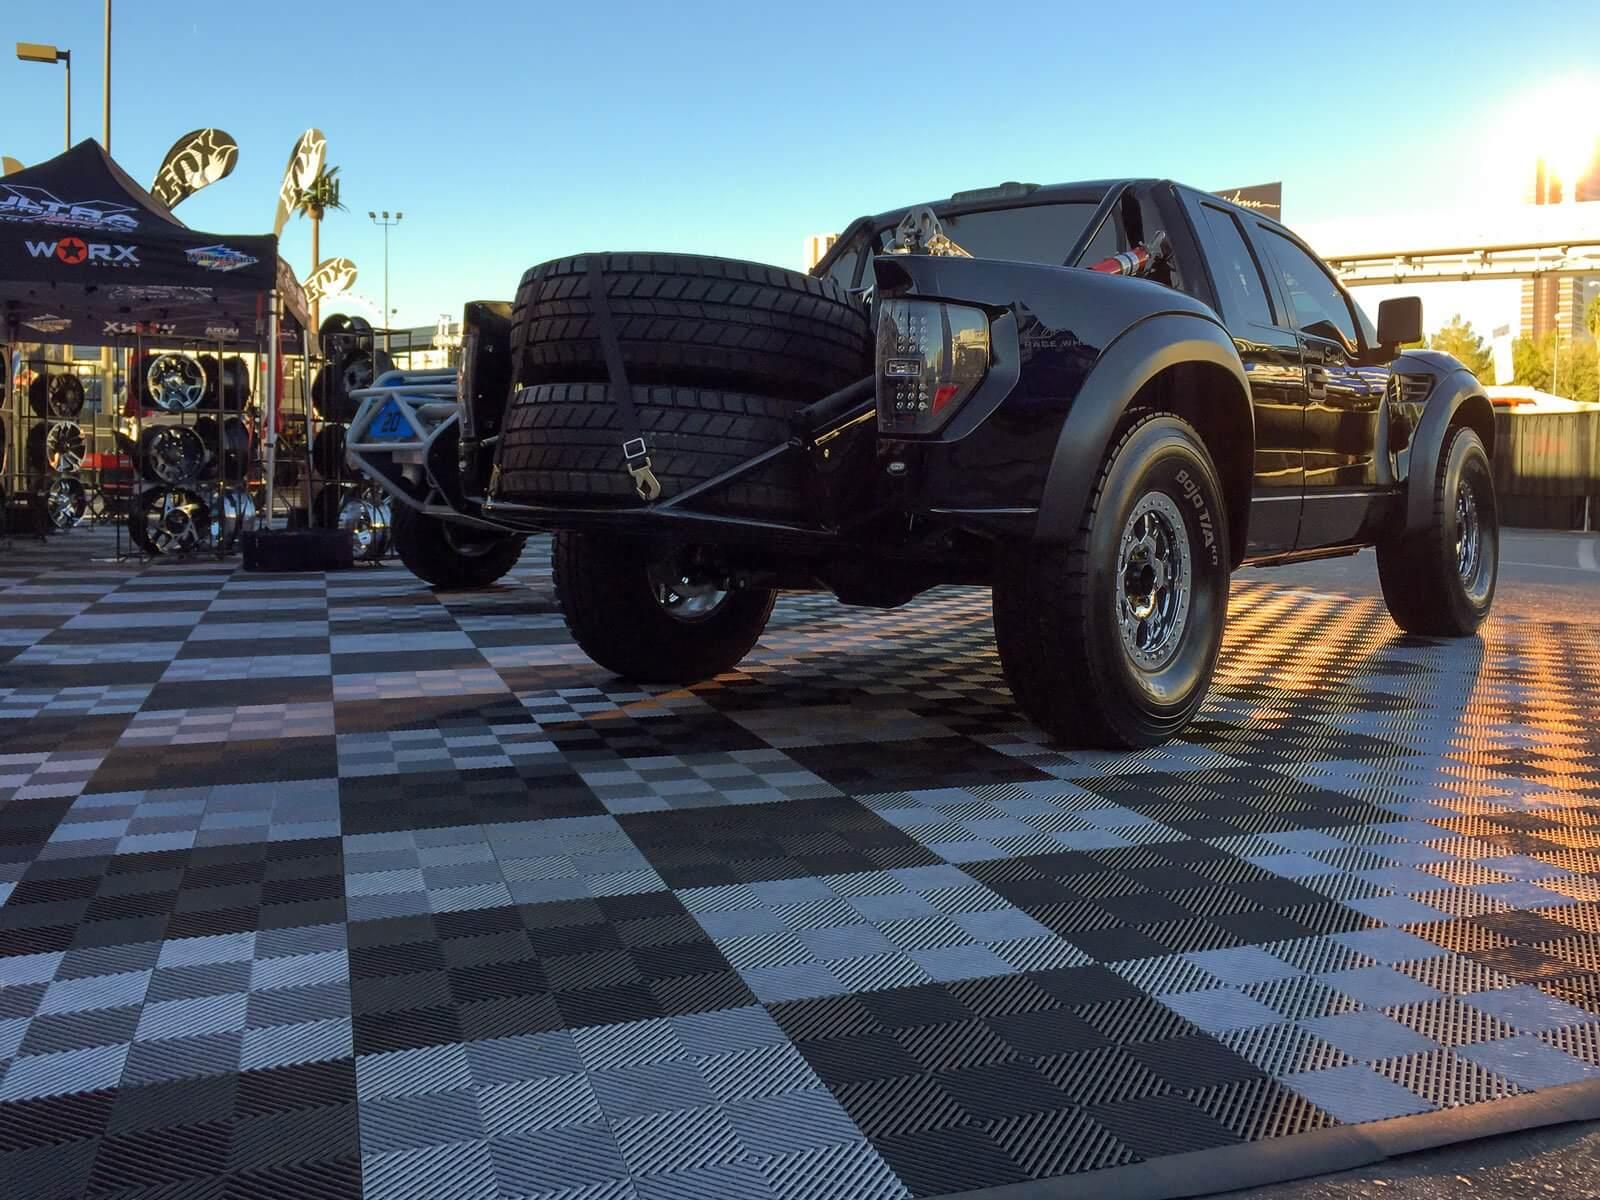 dcc89e0db Car Shows & Trade Shows Gallery - RaceDeck